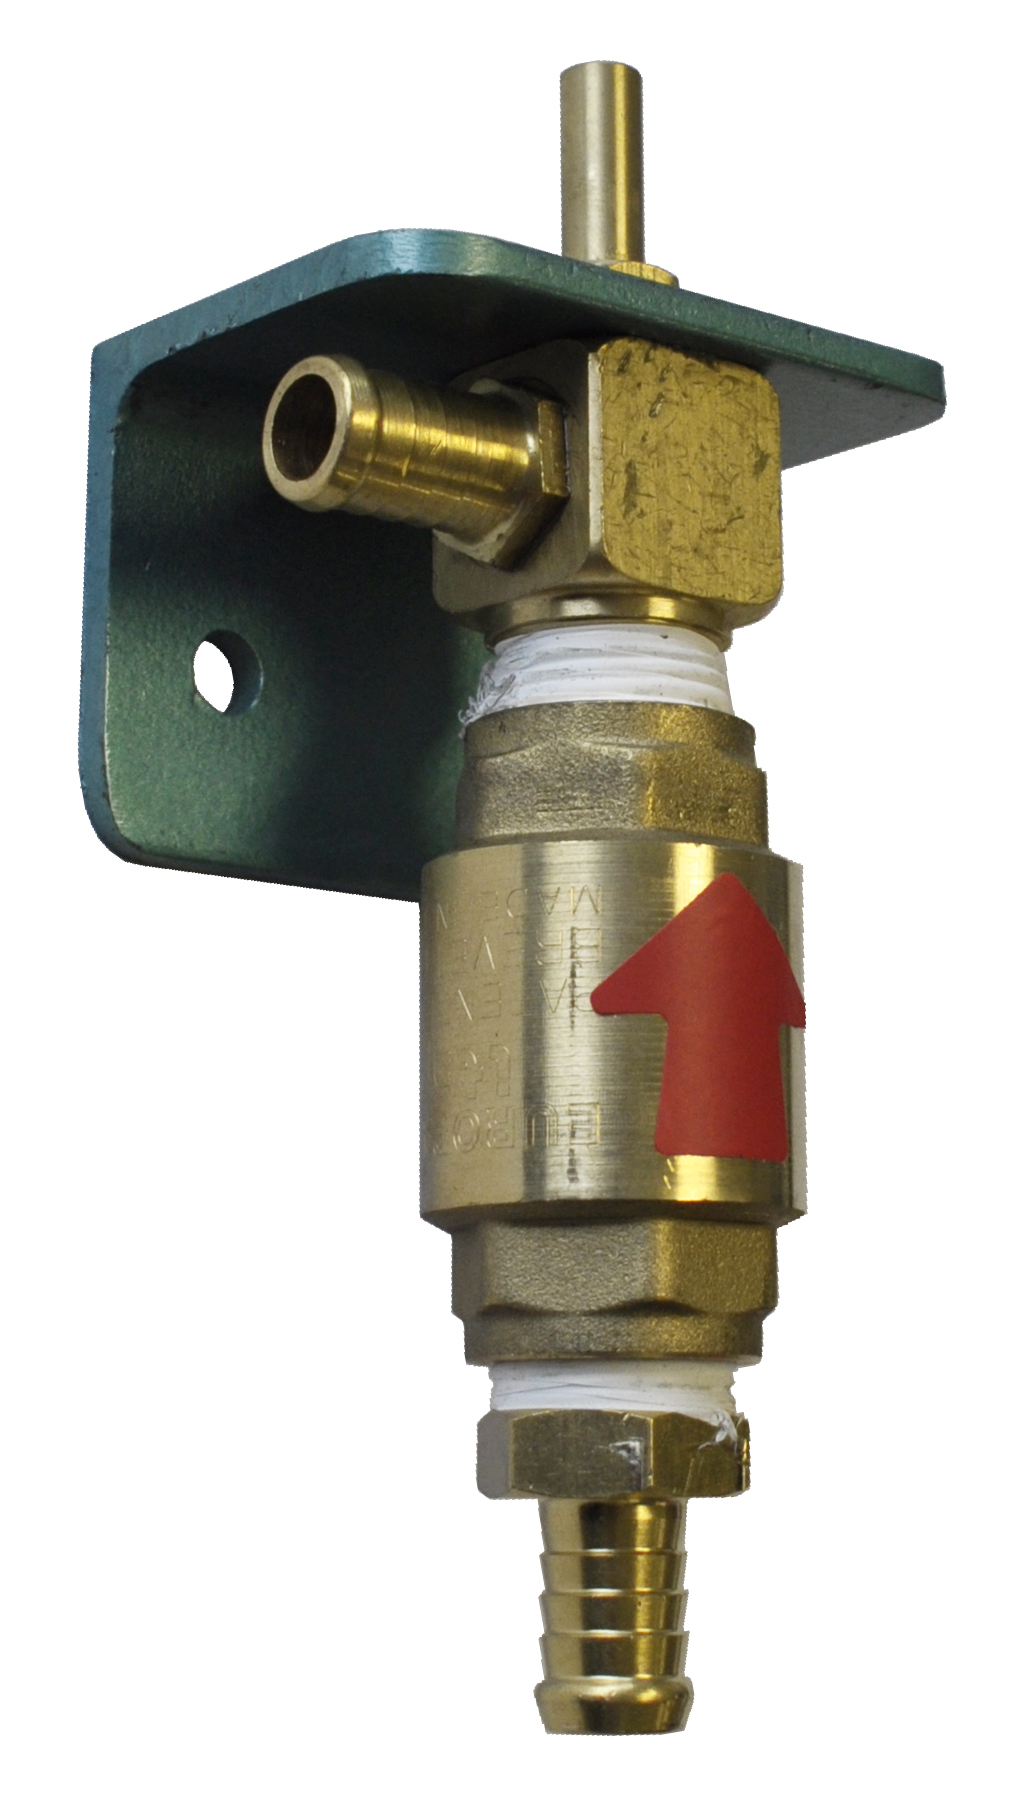 Door Switch Safety : Door accessories pneumatic safety switch